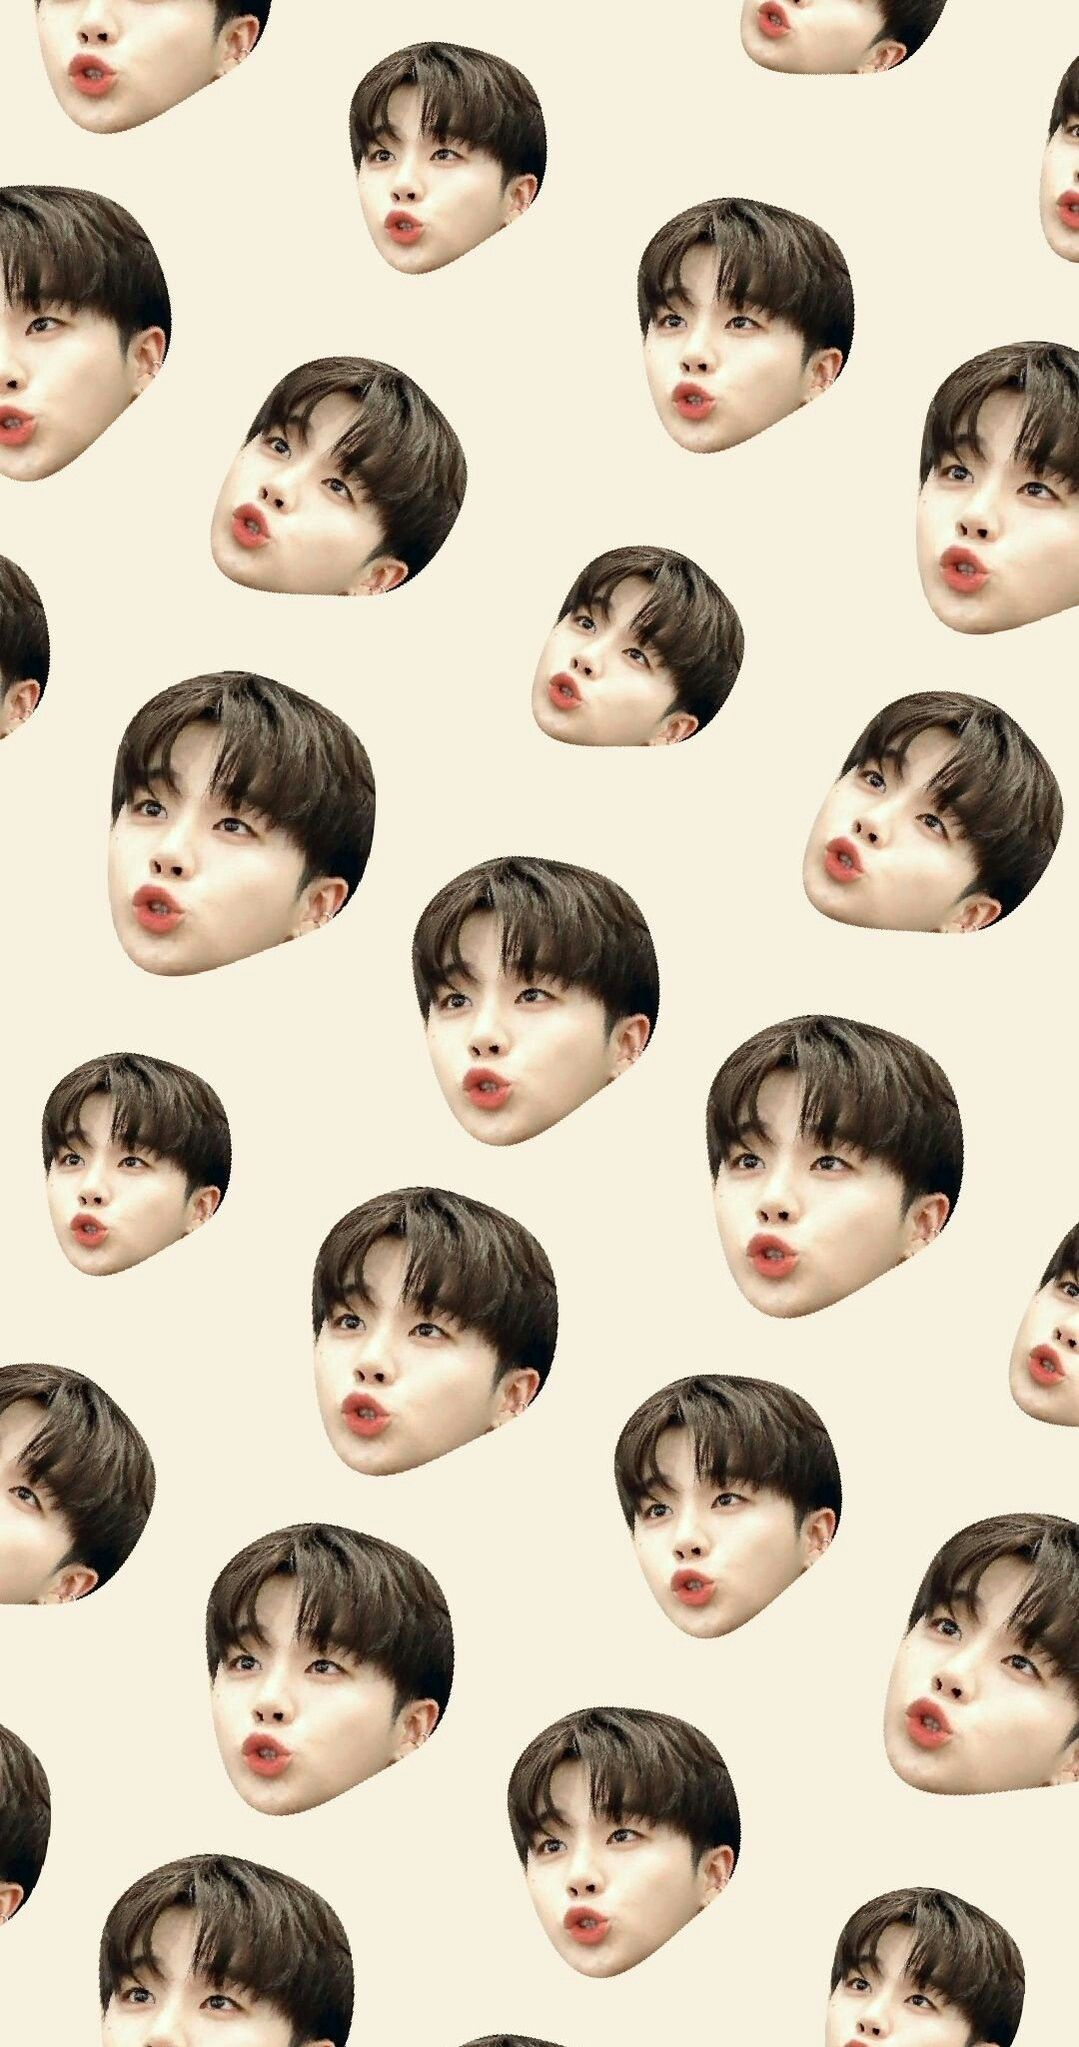 Pin oleh Jugu di iKON JINHWAN ㅡ WALLPAPER Ikon, Meme, Kimbab